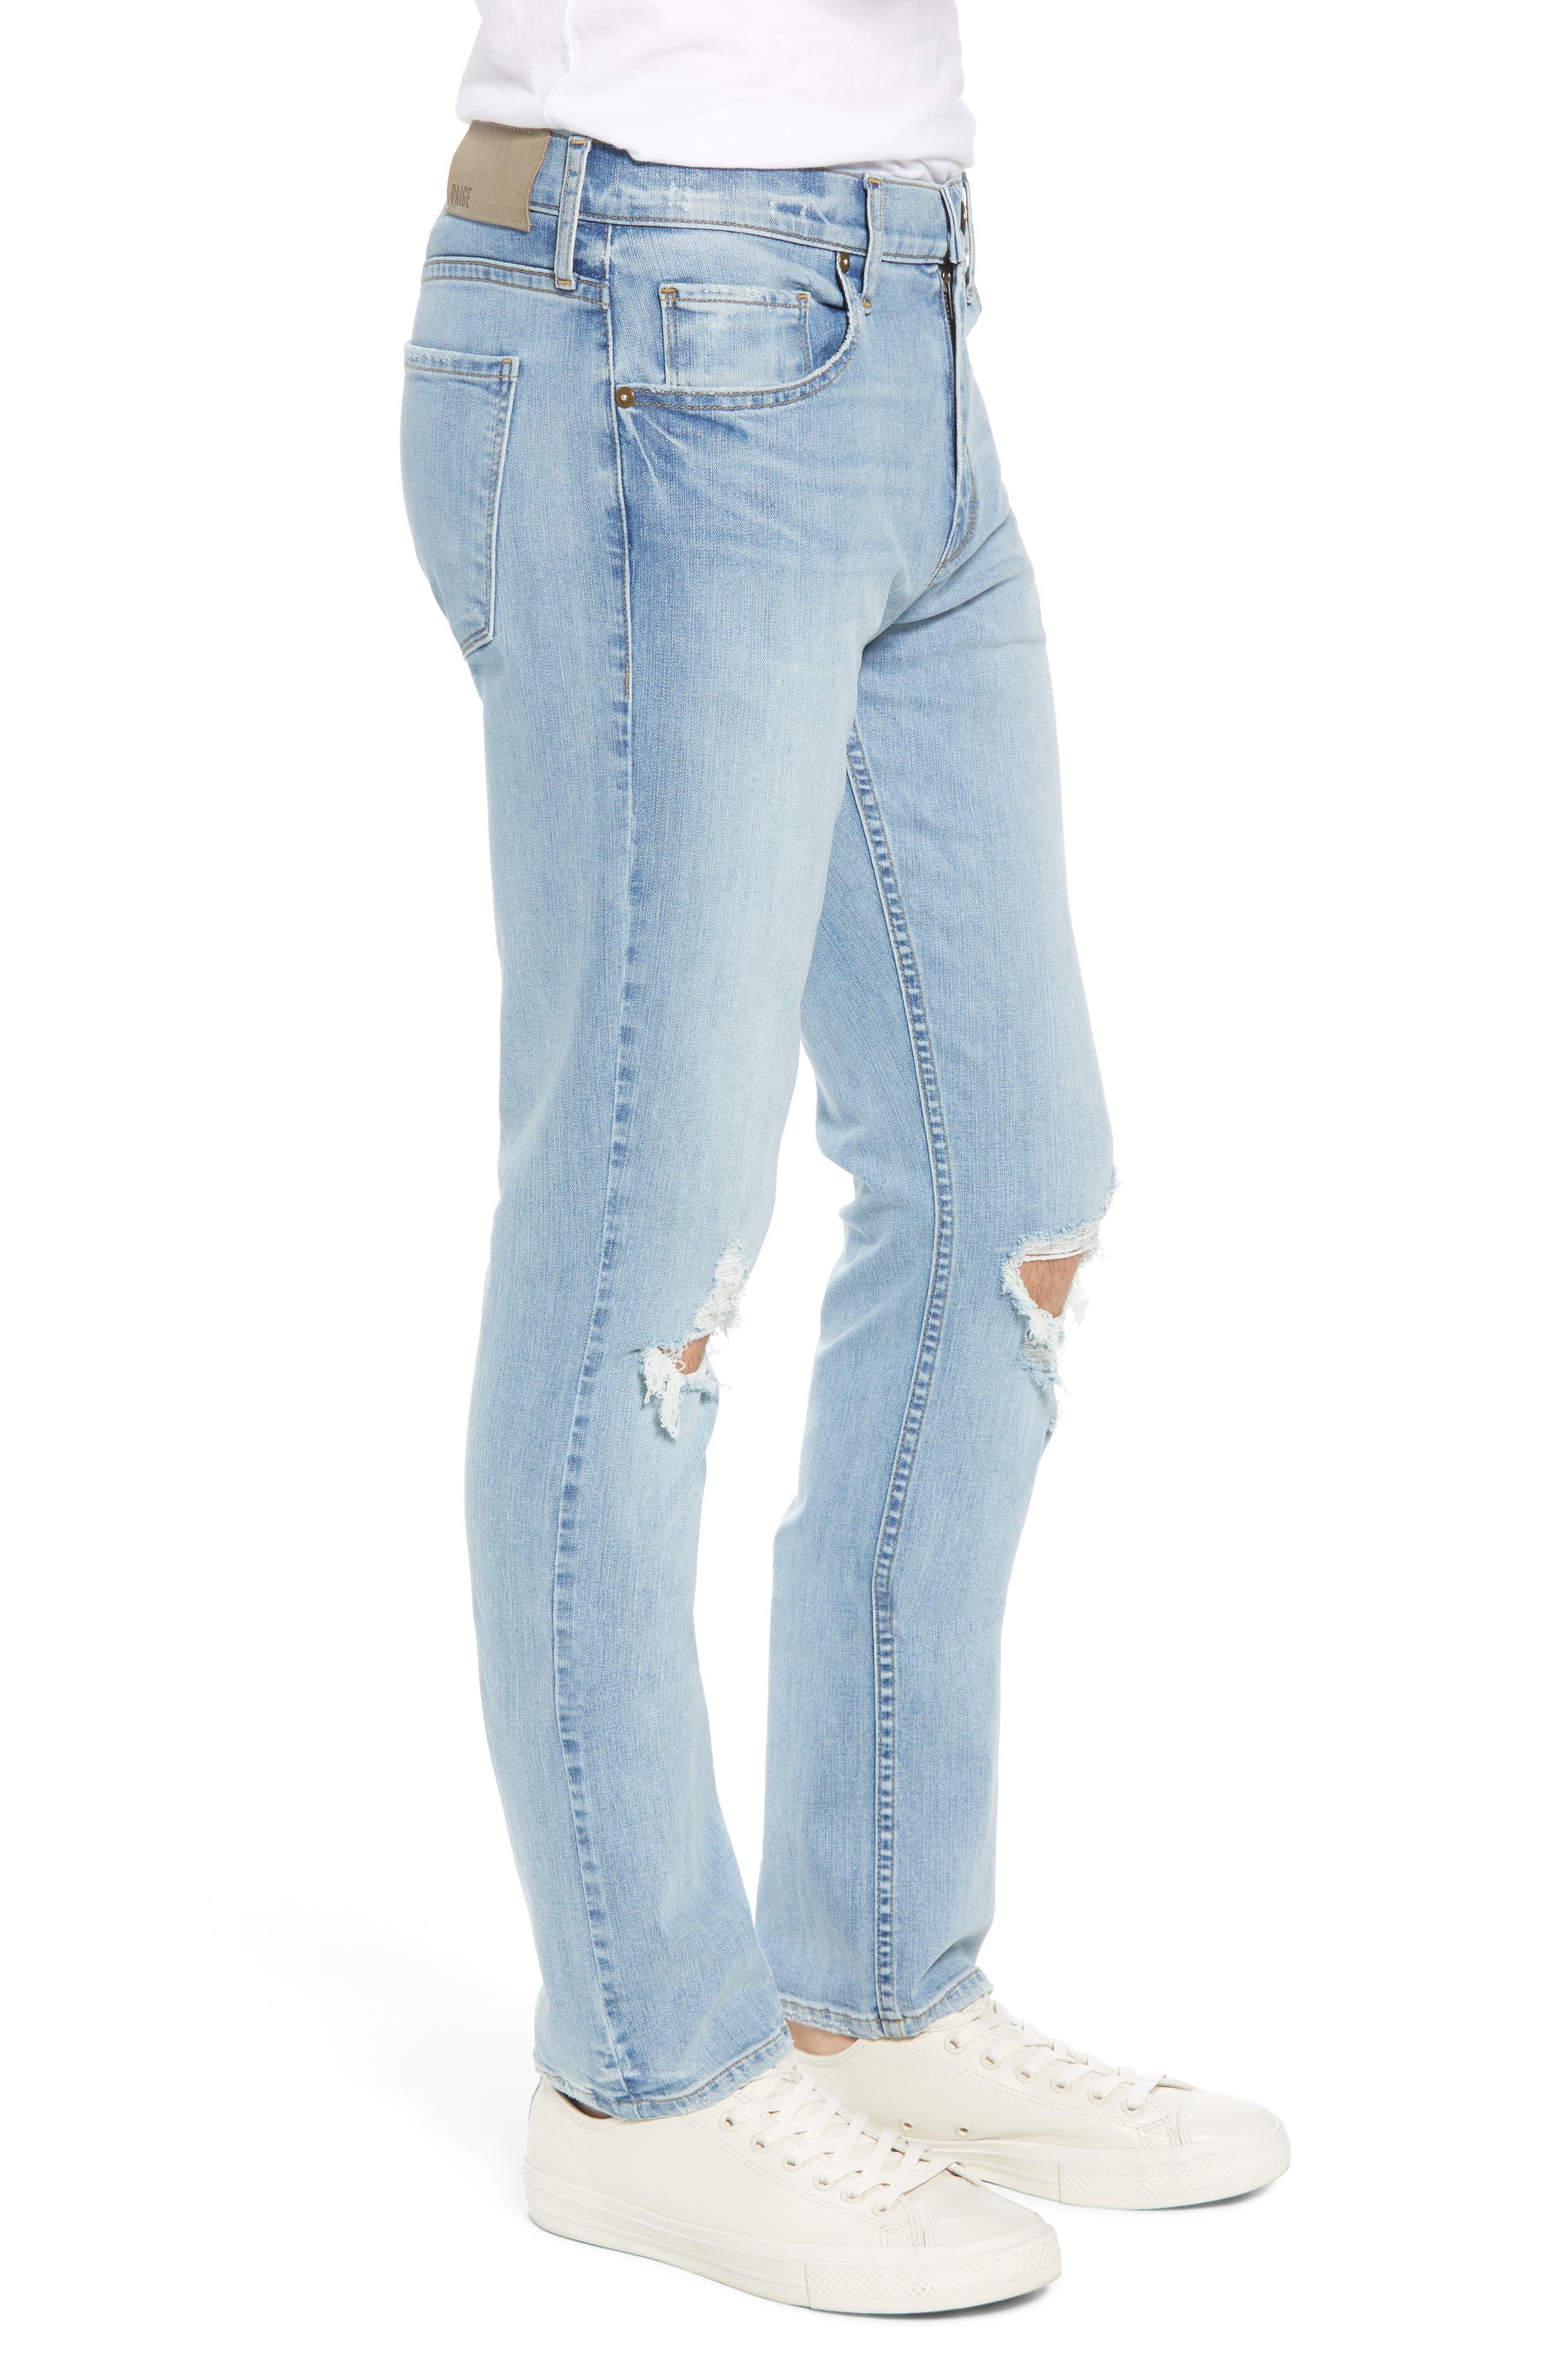 Lennox Slim Fit Jeans,                             Alternate thumbnail 4, color,                             County Destructed